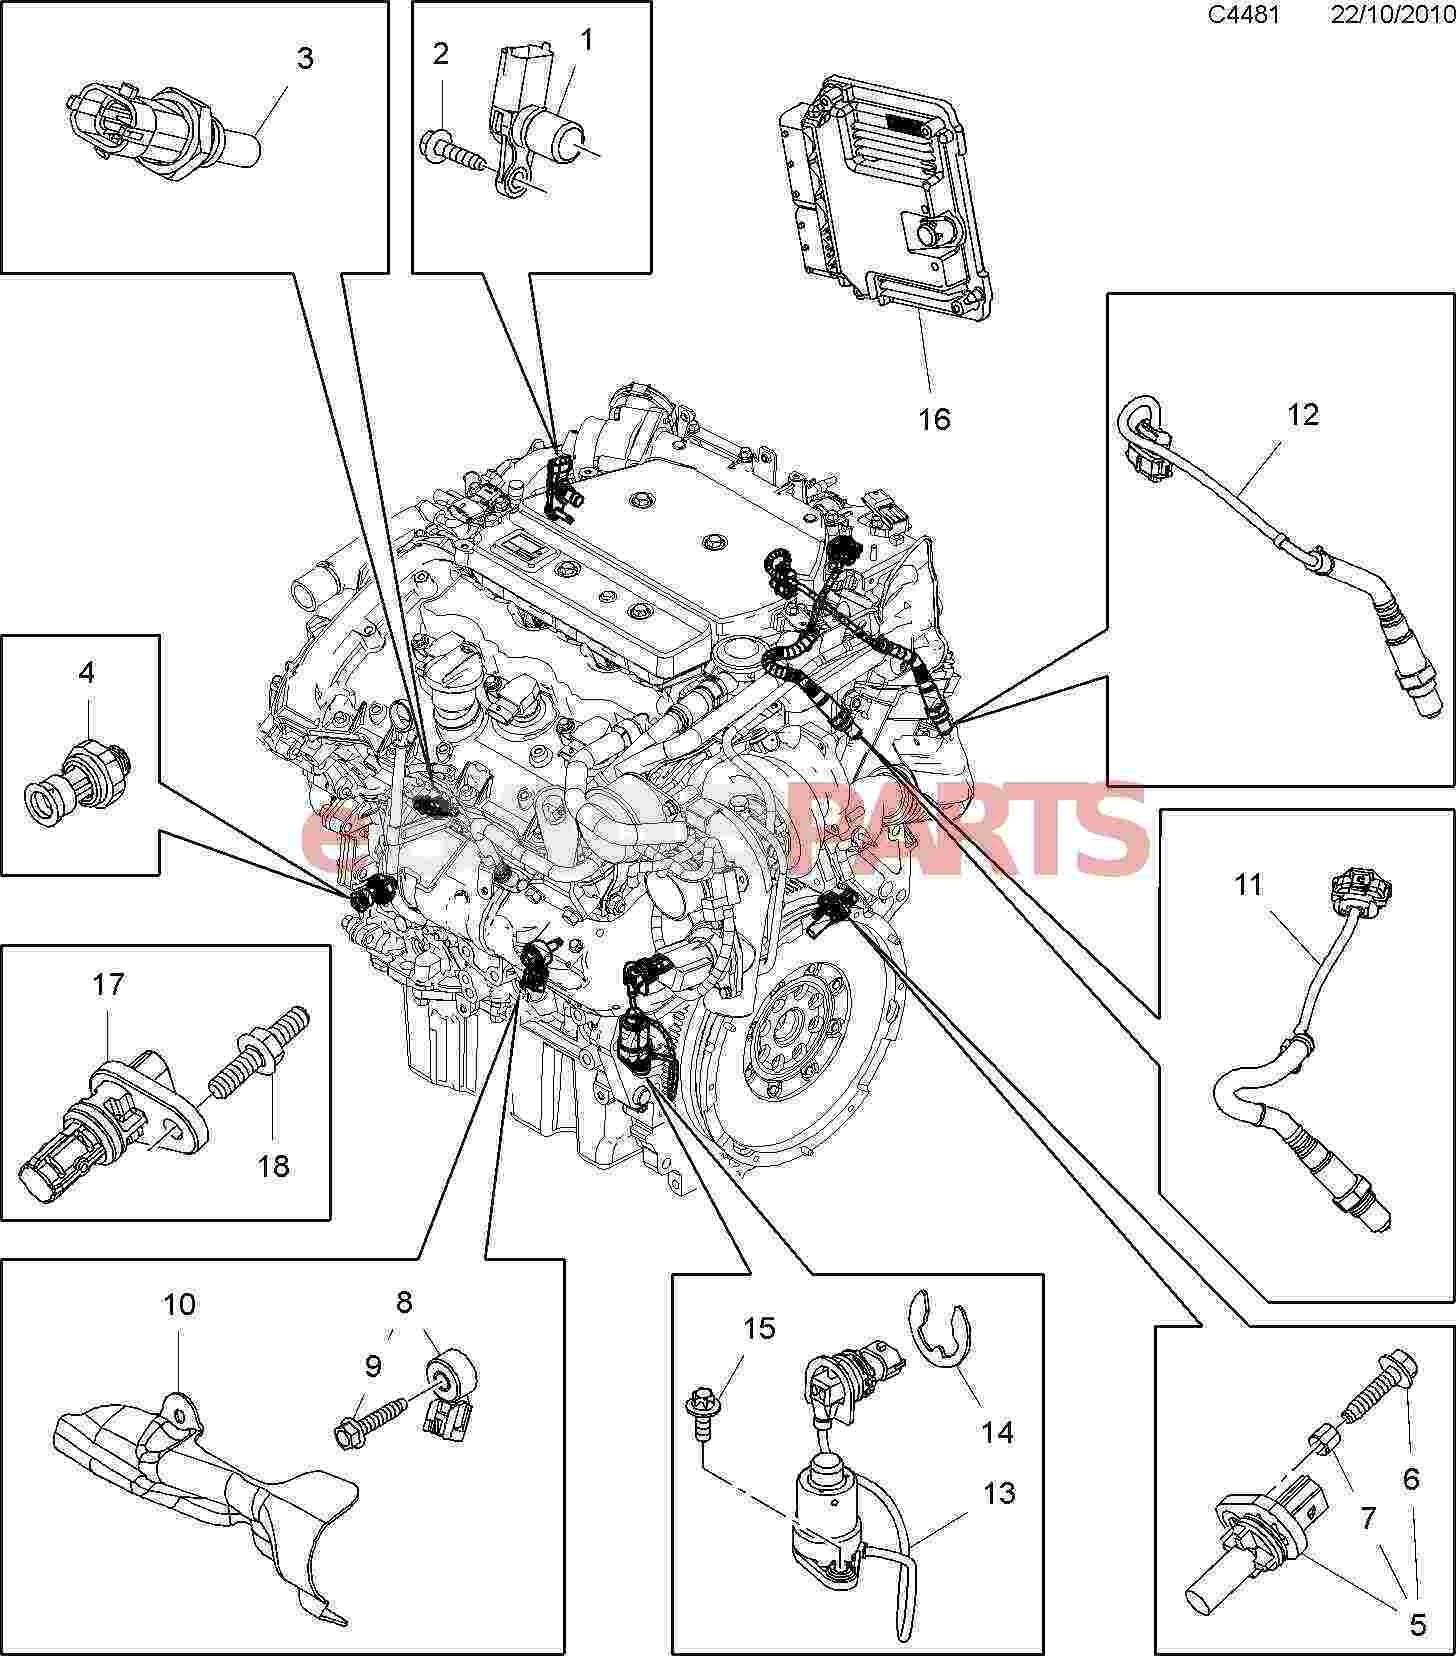 Simple Engine Breakdown Diagrams Great Installation Of Wiring Jeep Diagram 2001 9 5 Saab 3 0 Scematic Rh 90 Jessicadonath De 3406 Cat Parts 40l